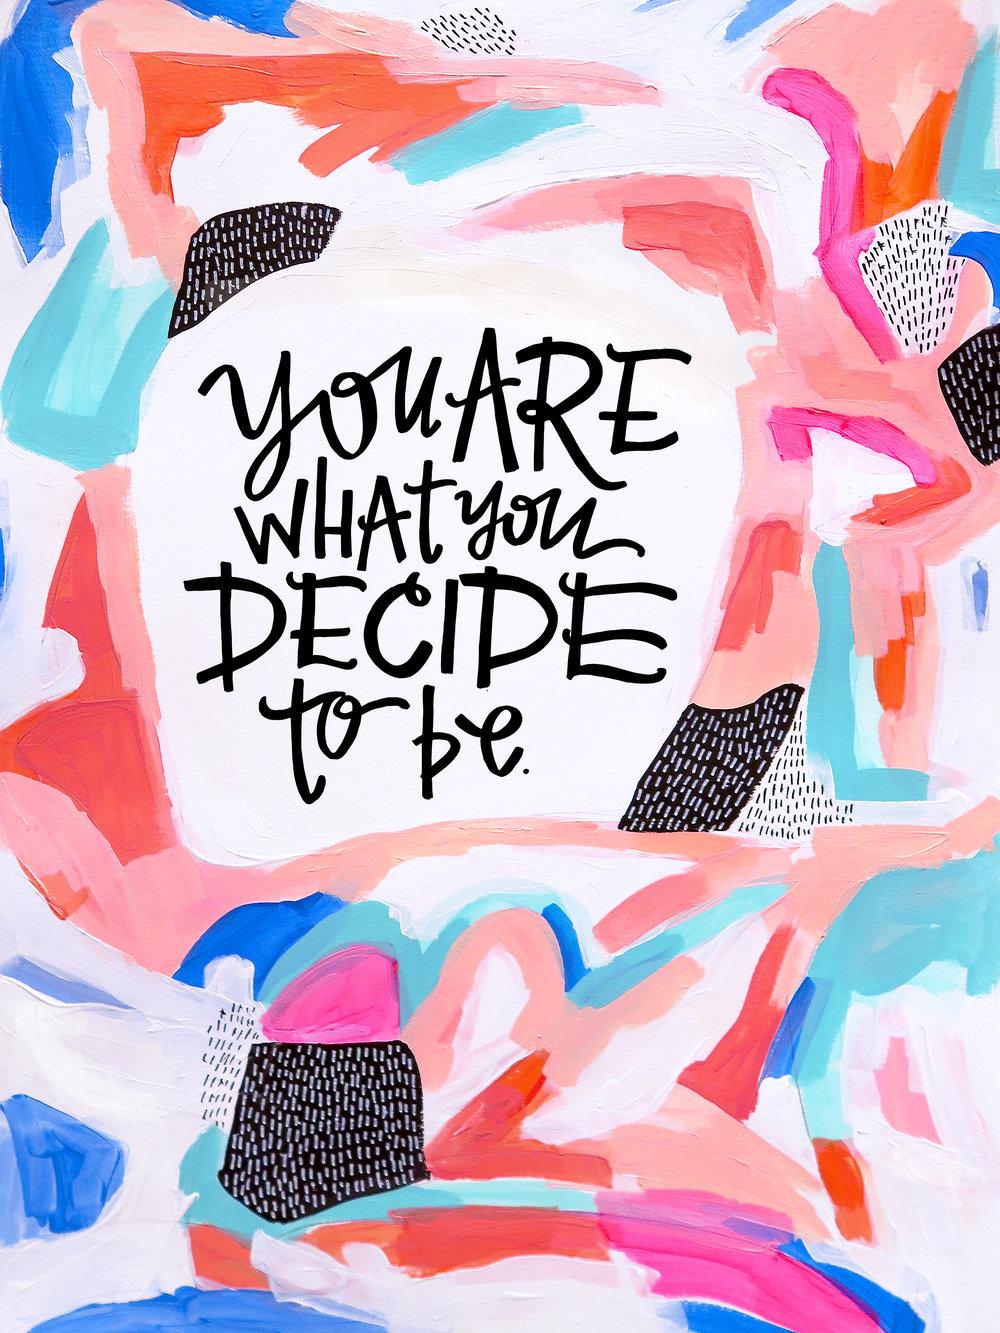 3/25/16: Decide